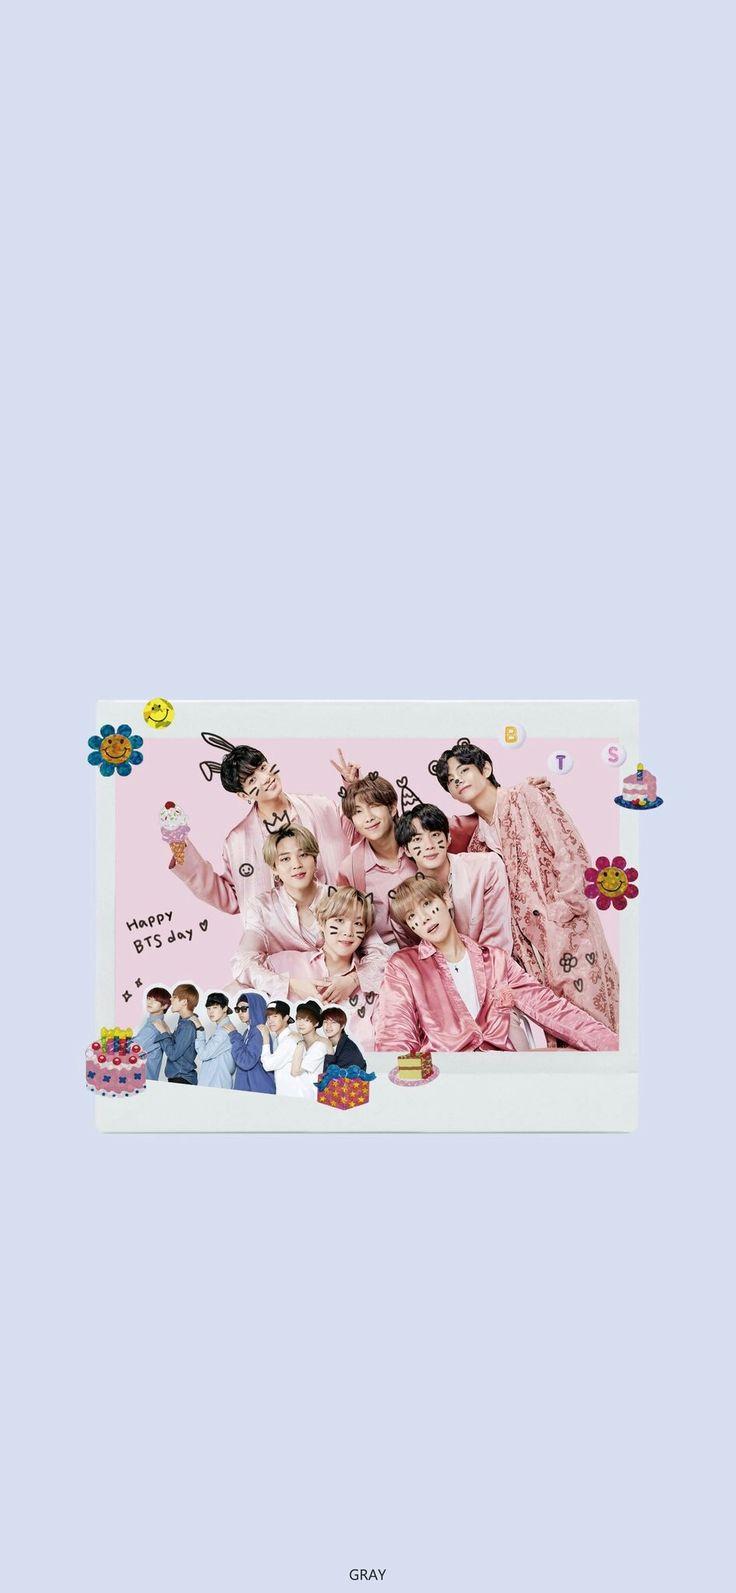 HAPPY BTS DAY 💜💜💜💜   Bts wallpaper, Bts pictures, Disney phone ...